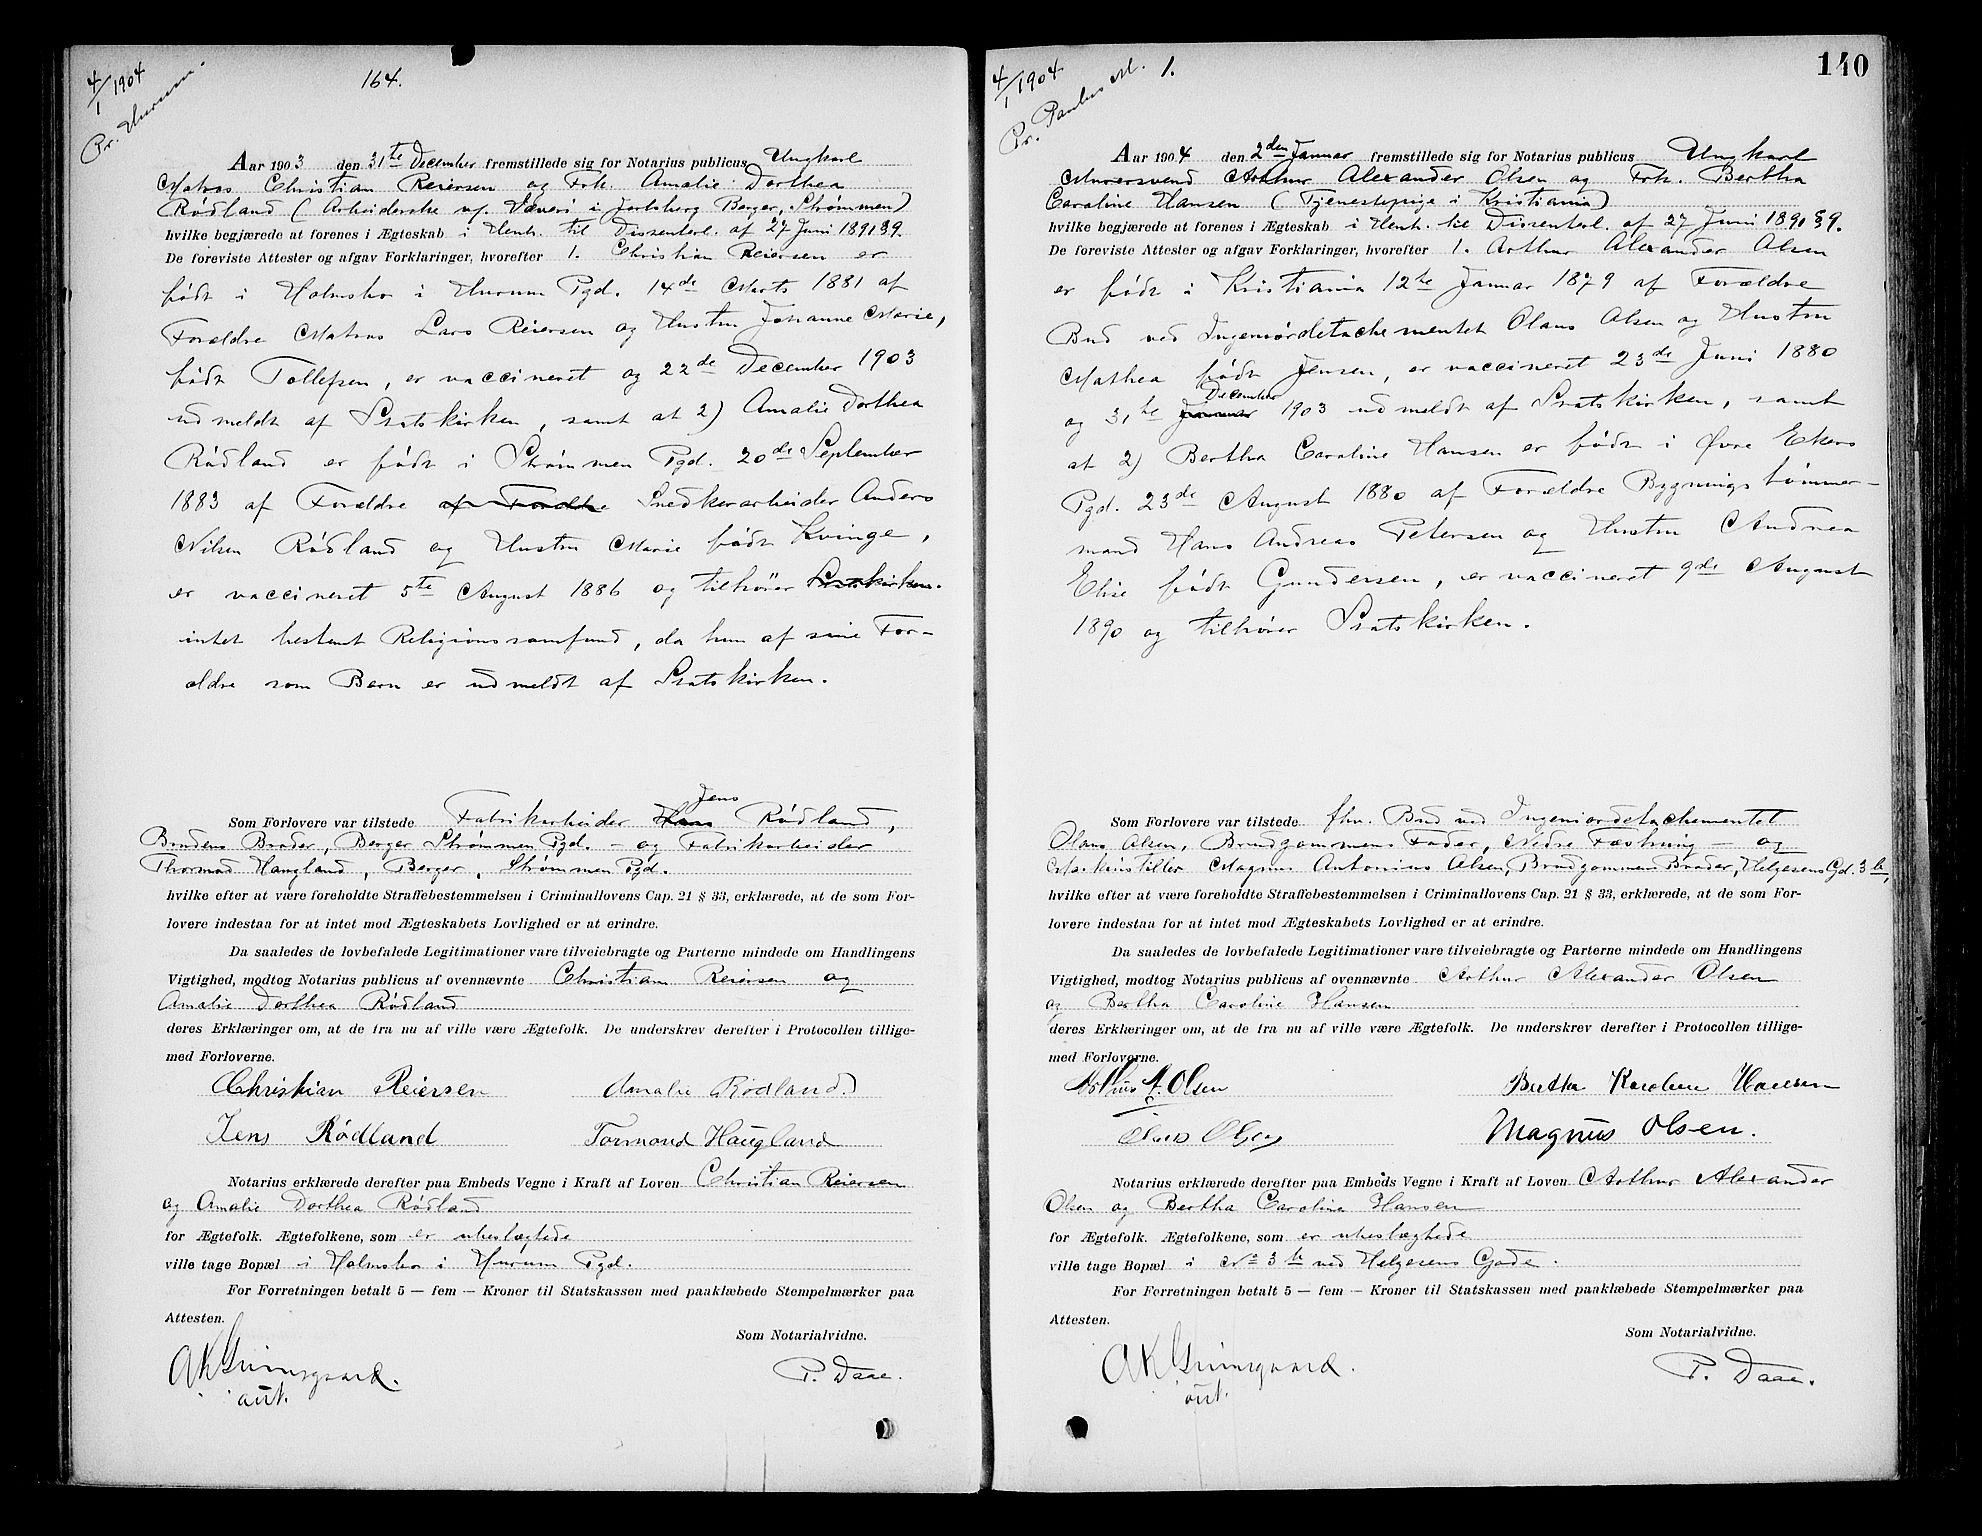 SAO, Oslo byfogd avd. I, L/Lb/Lbb/L0006: Notarialprotokoll, rekke II: Vigsler, 1902-1907, s. 139b-140a